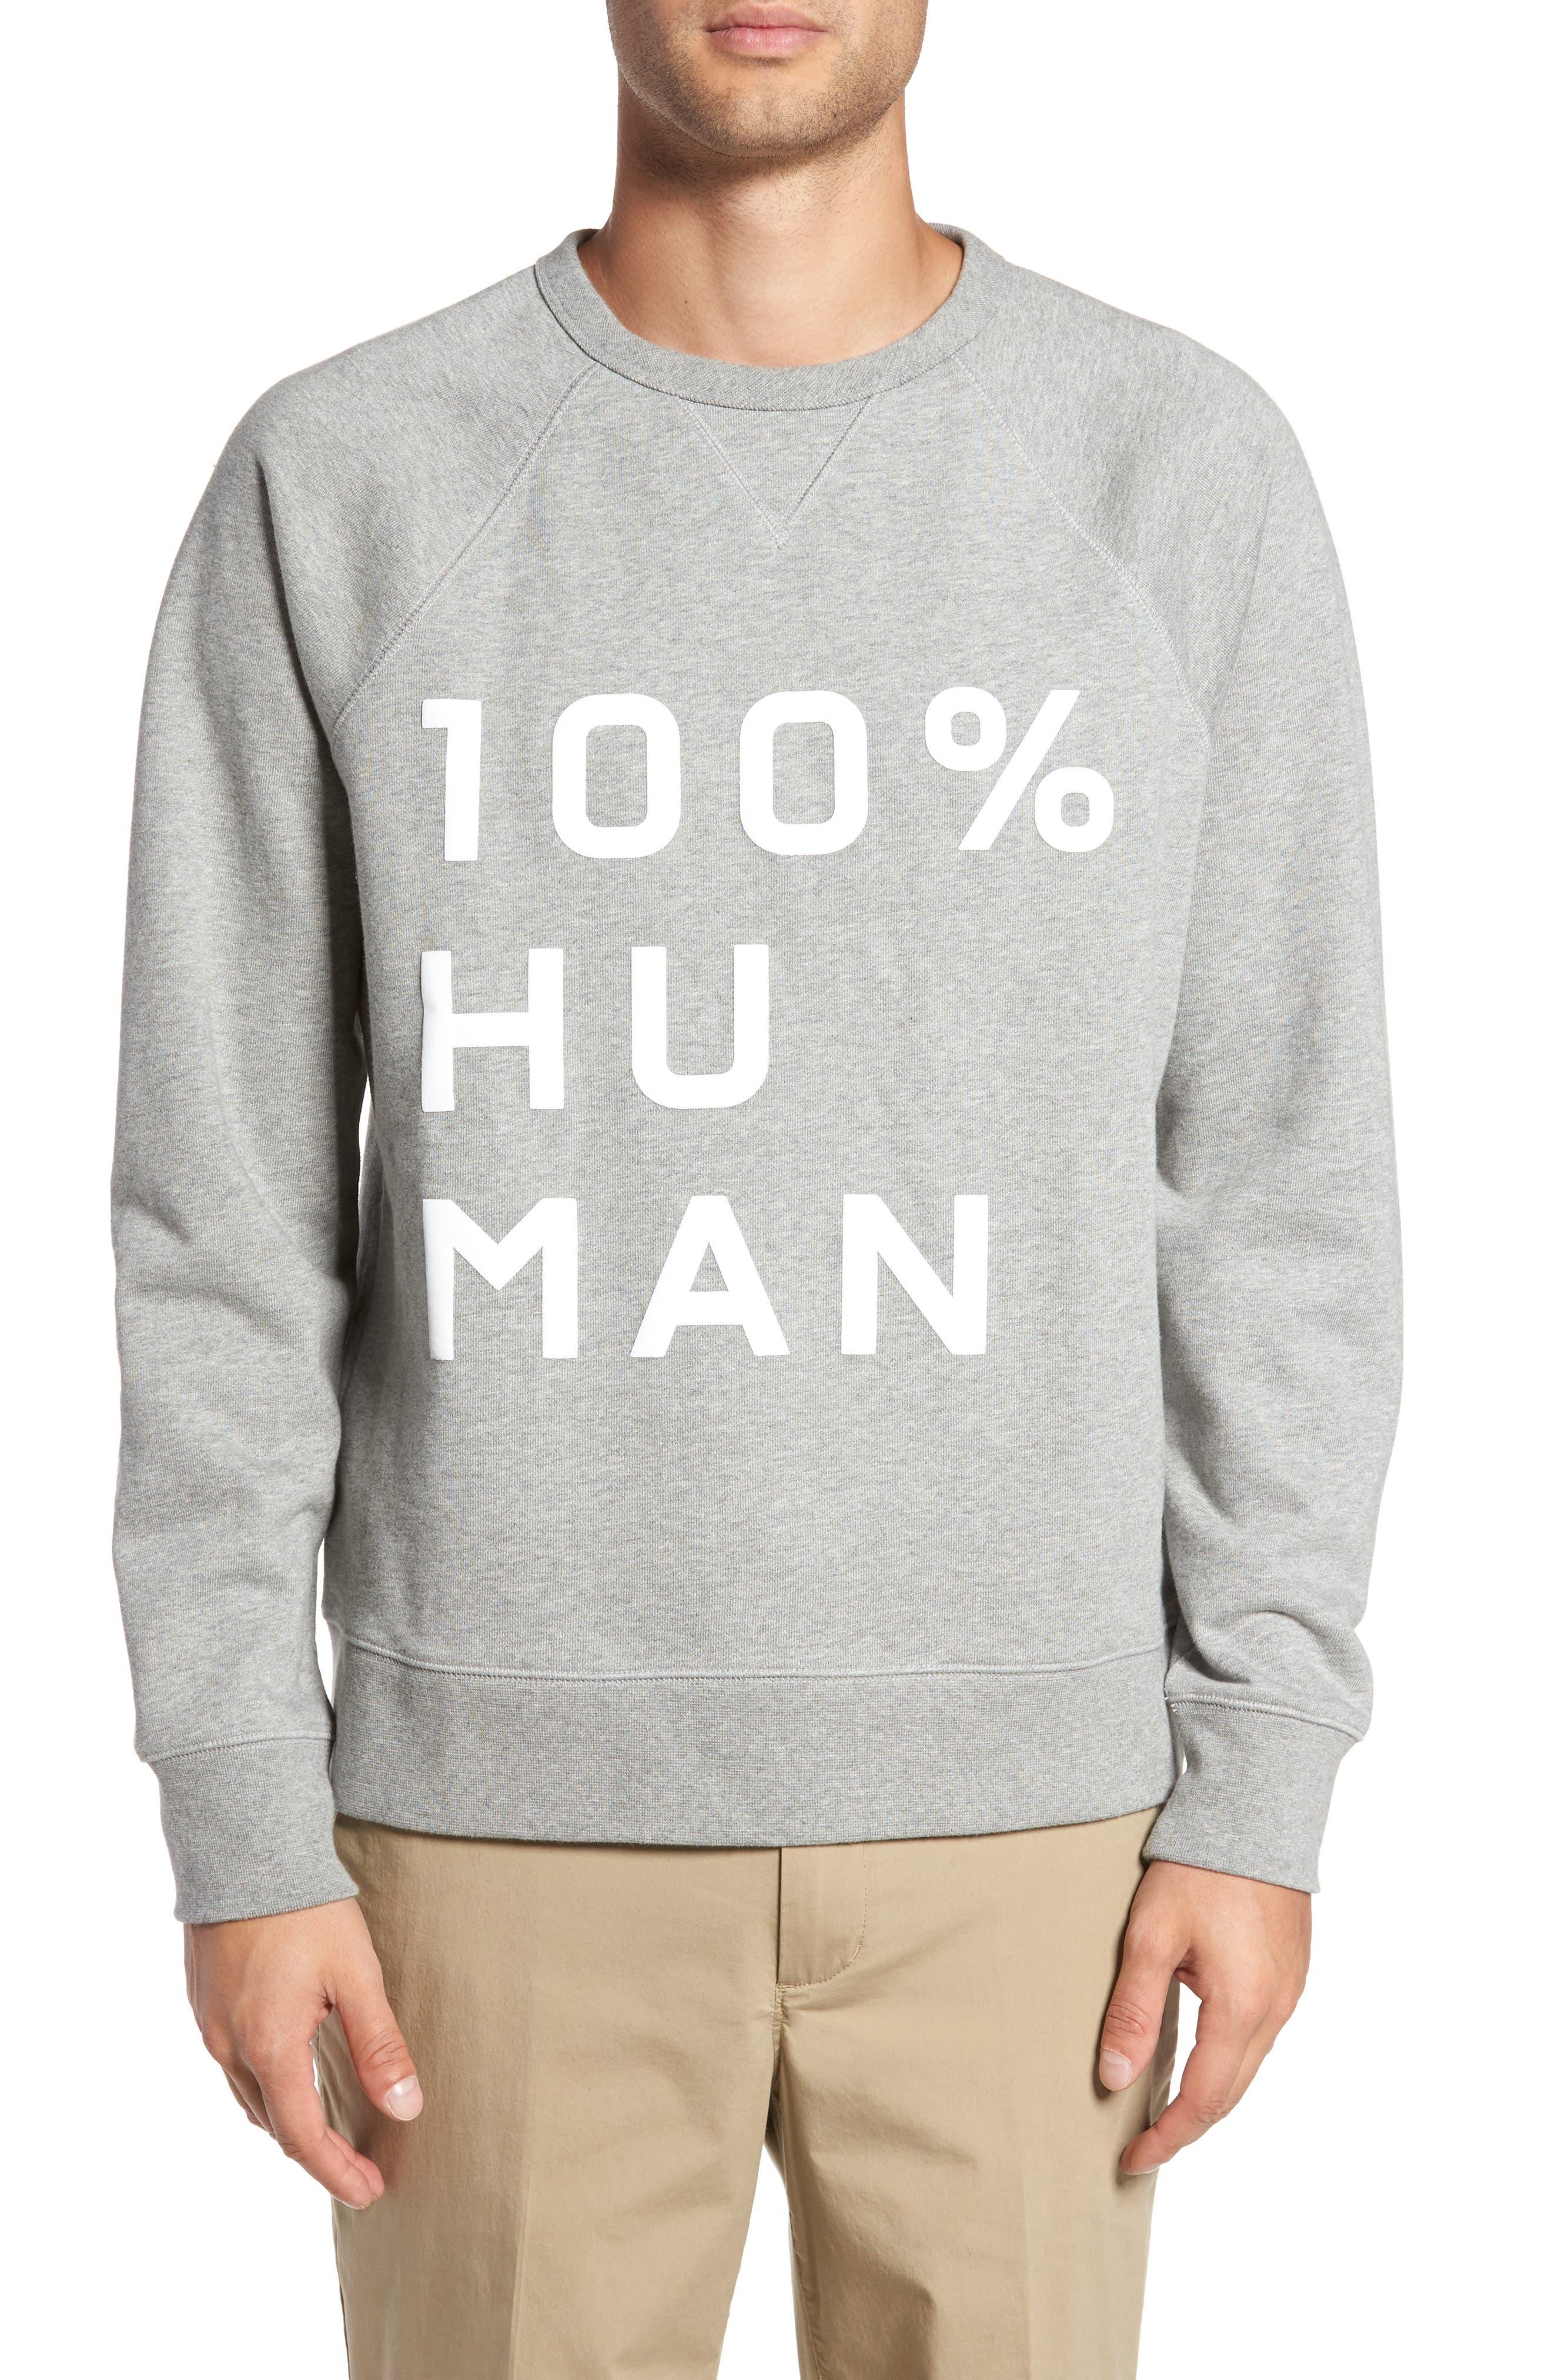 Main Image - Everlane The 100% Human Unisex French Terry Sweatshirt